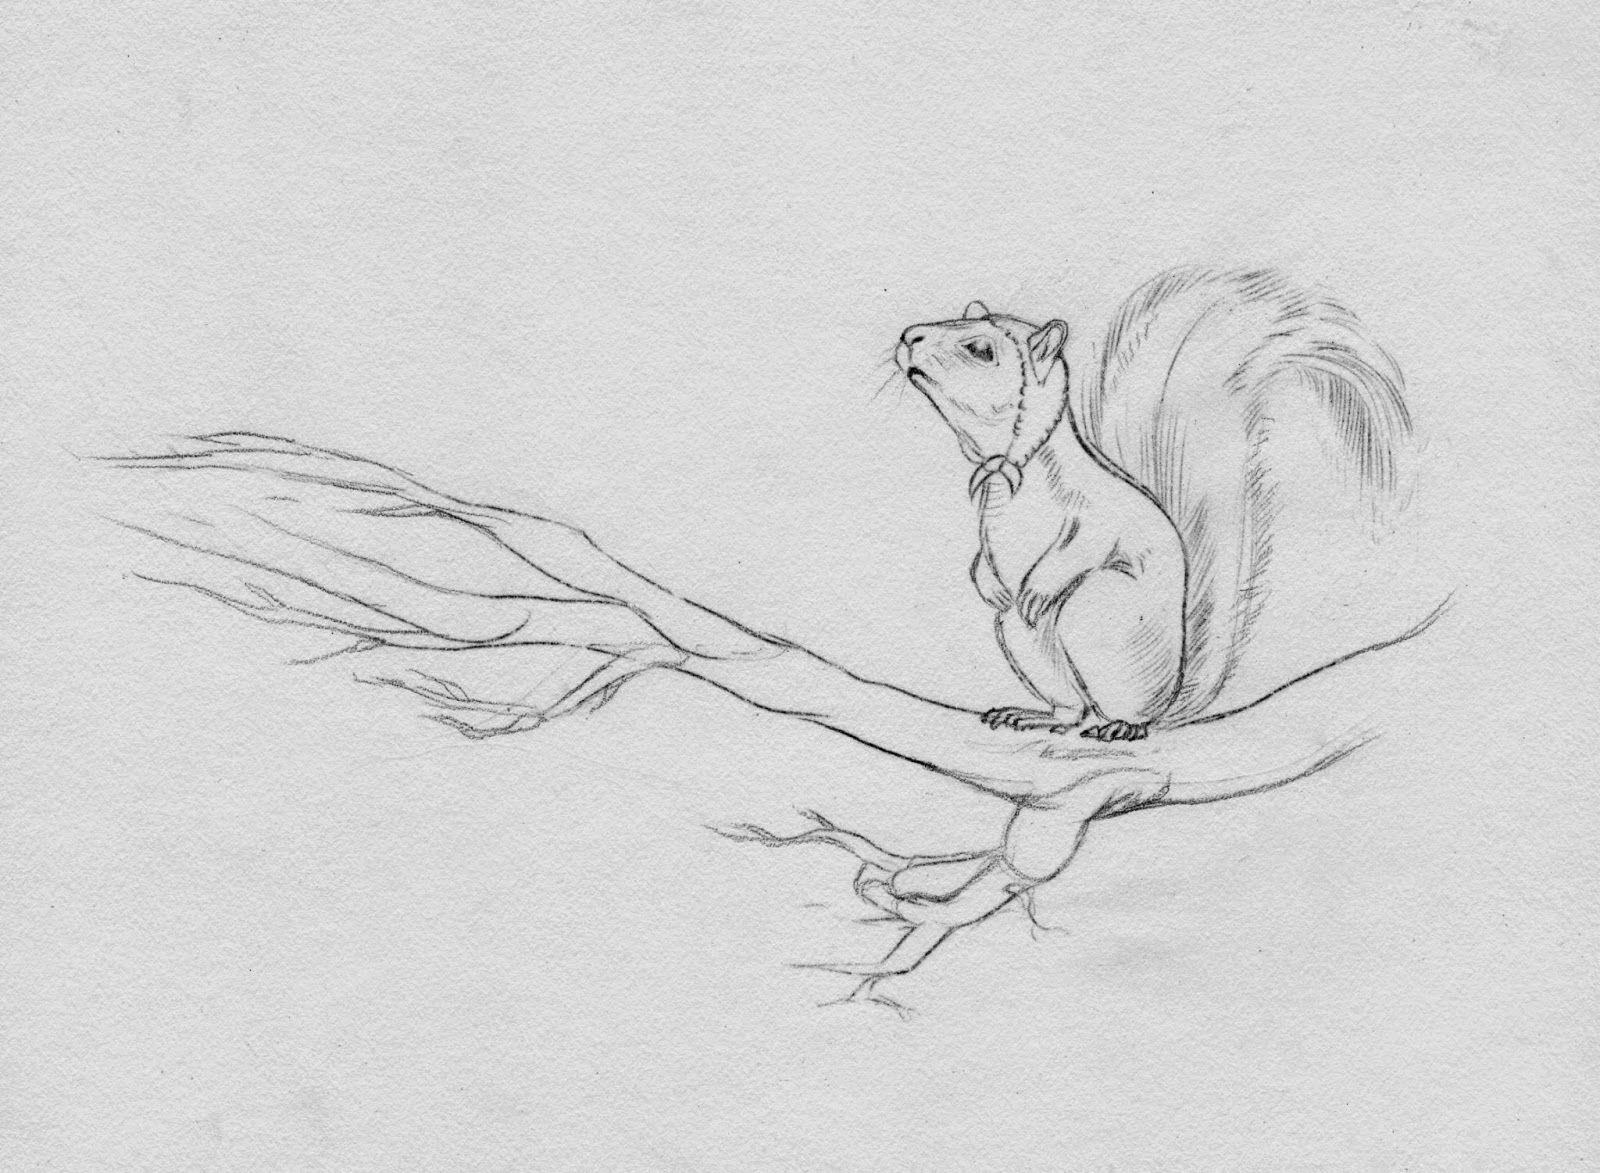 Shadiah Sketches: Squirrel For Magic Cabin Cartoon Sketchesmagazine  Editorialhow To Draweditorial Designsquirrelsvirginiacabinwatercolorsfairies